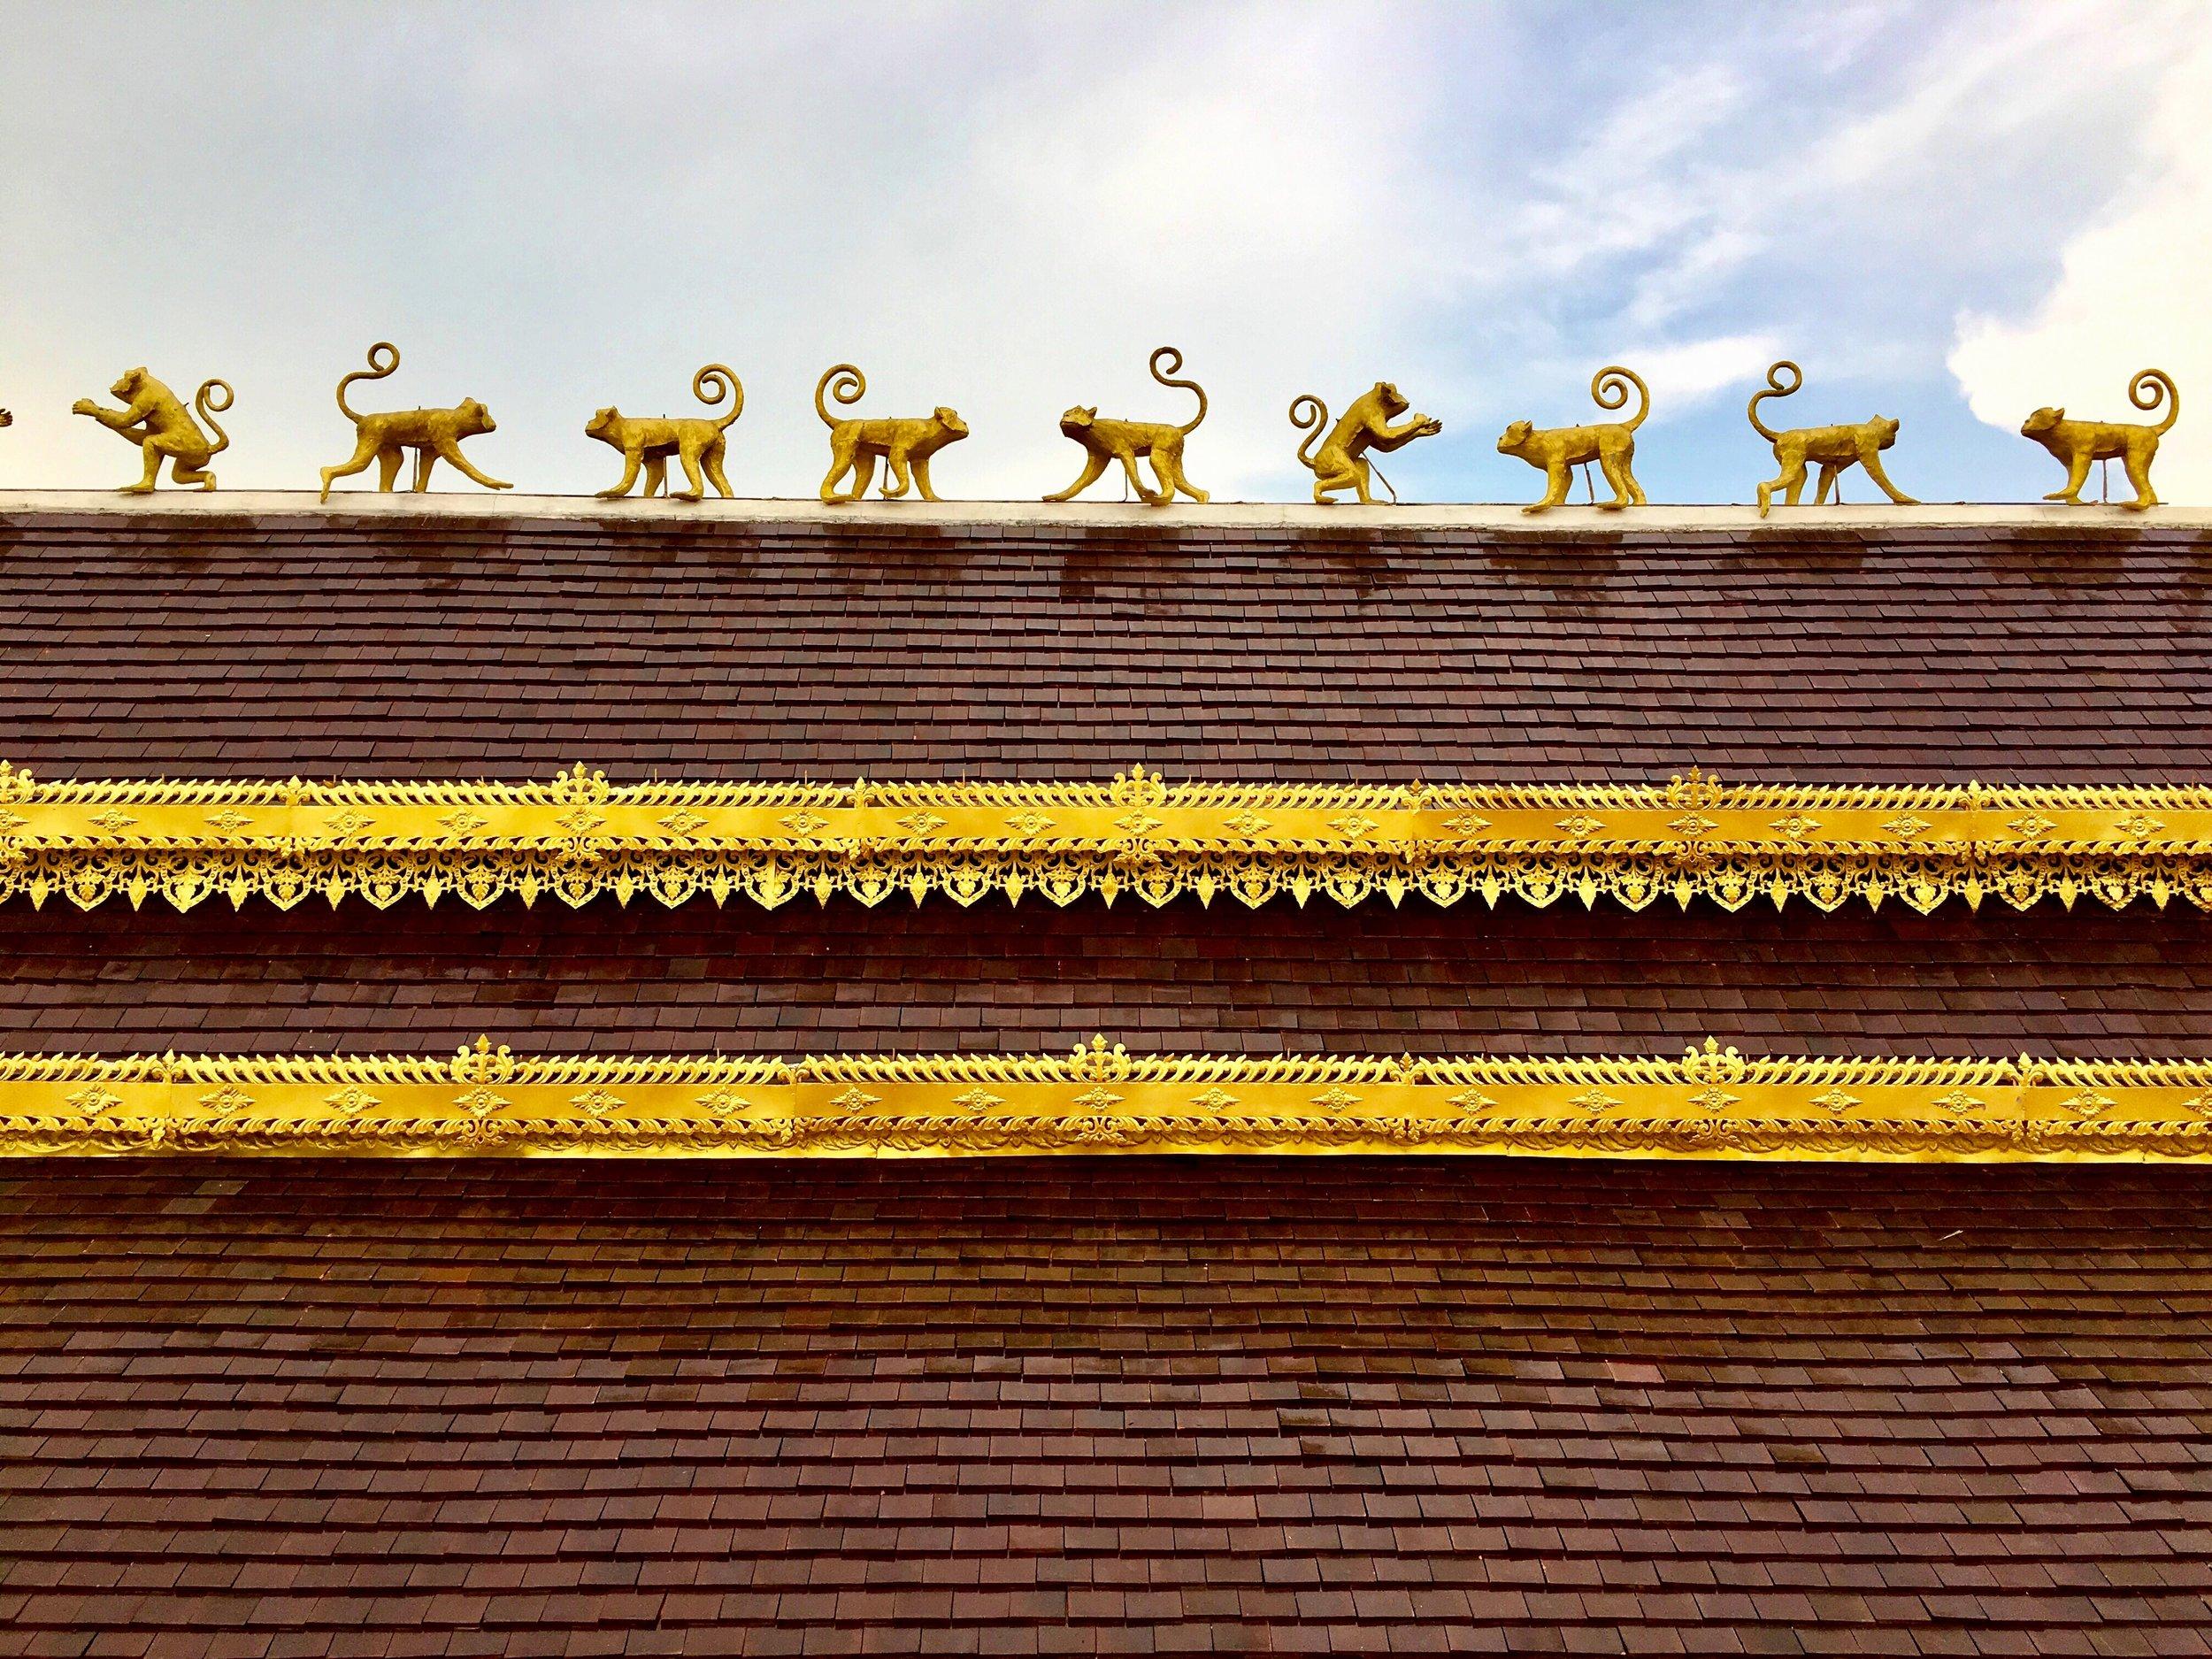 Monkeys line the sala roof